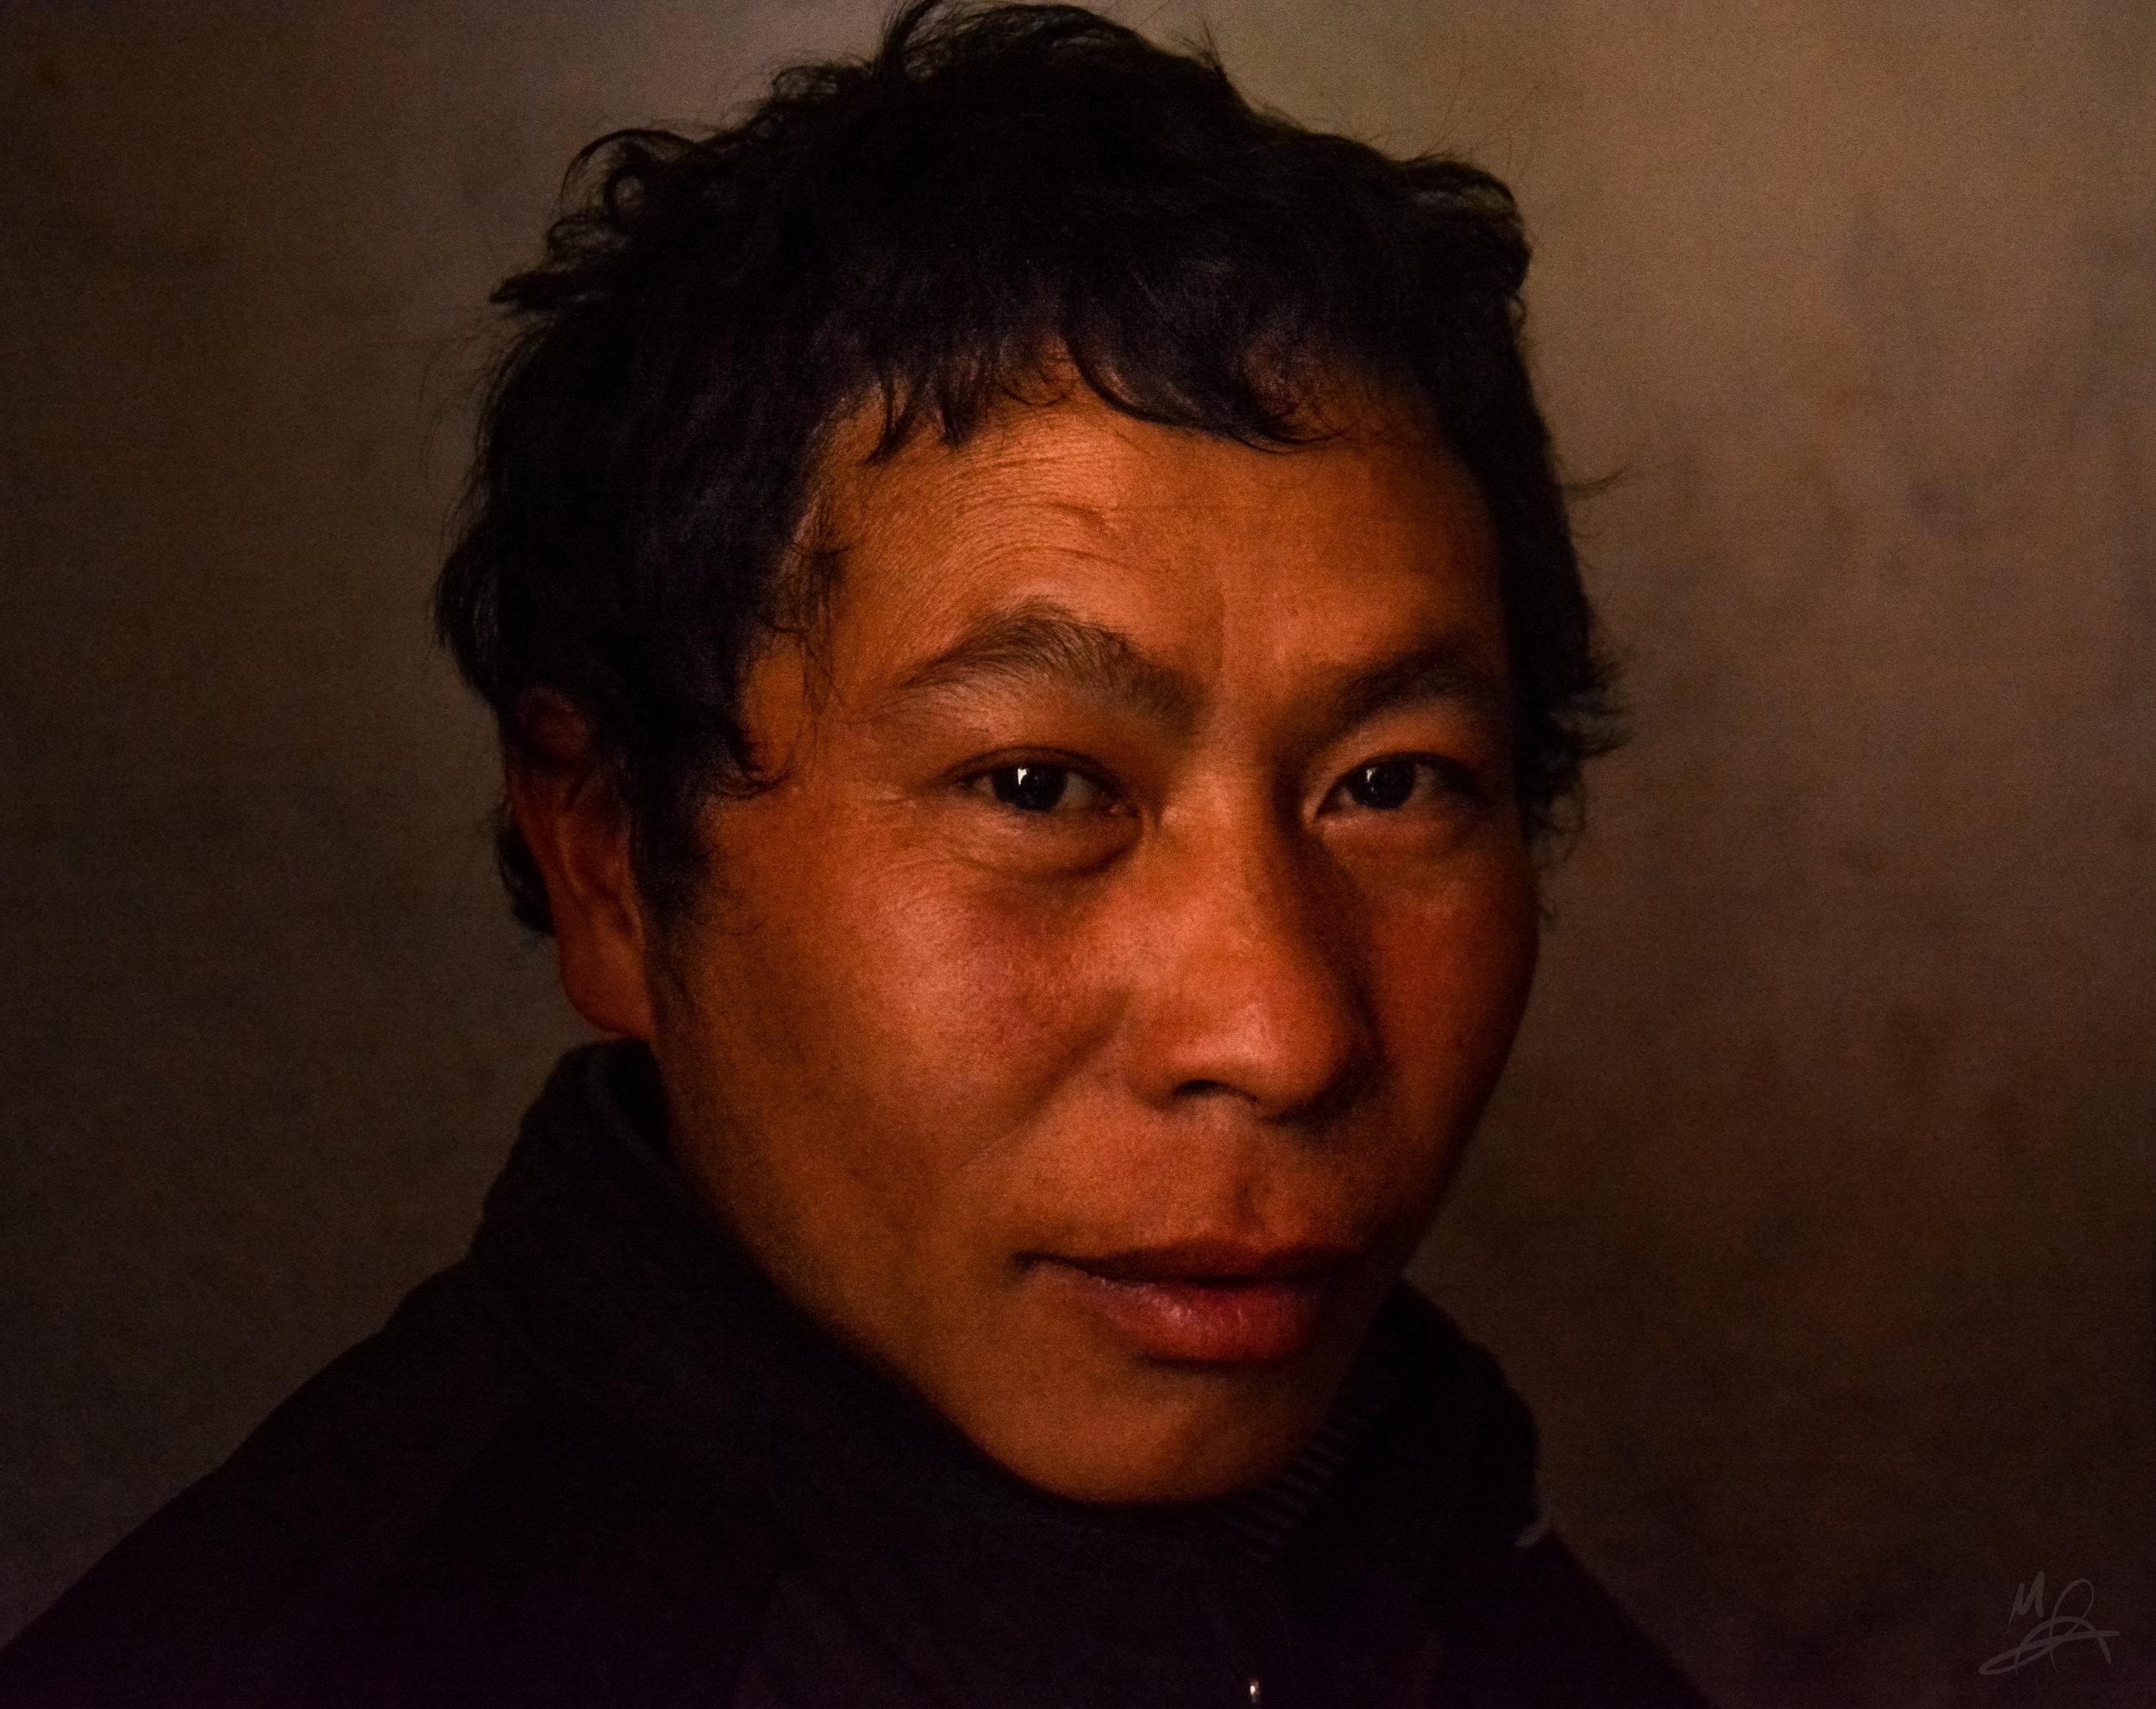 Man with rice wine